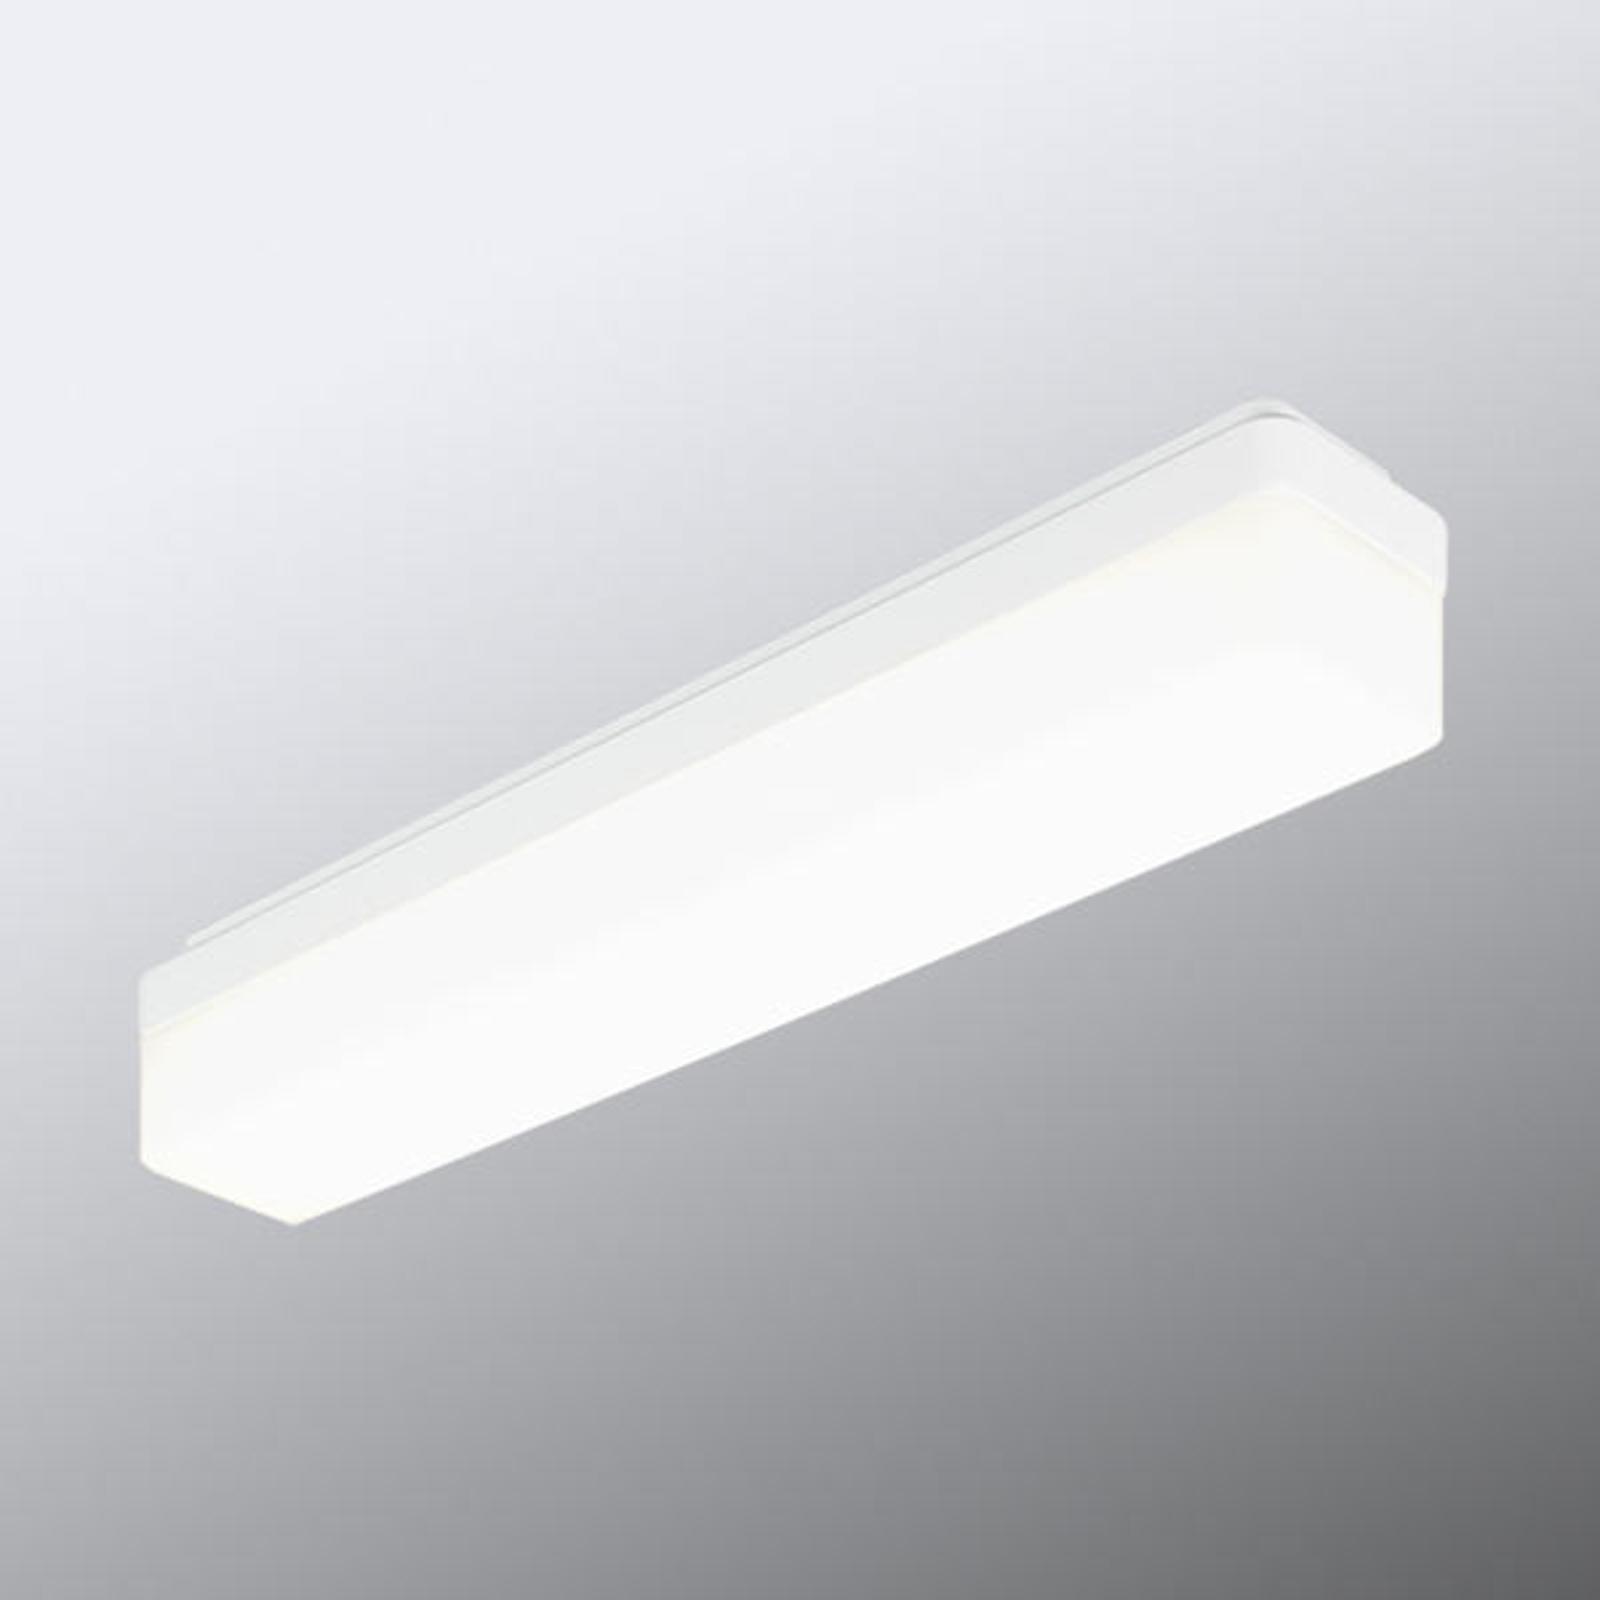 LED-taklampe A70-W365 LED 1000 HF 14 W 3000K